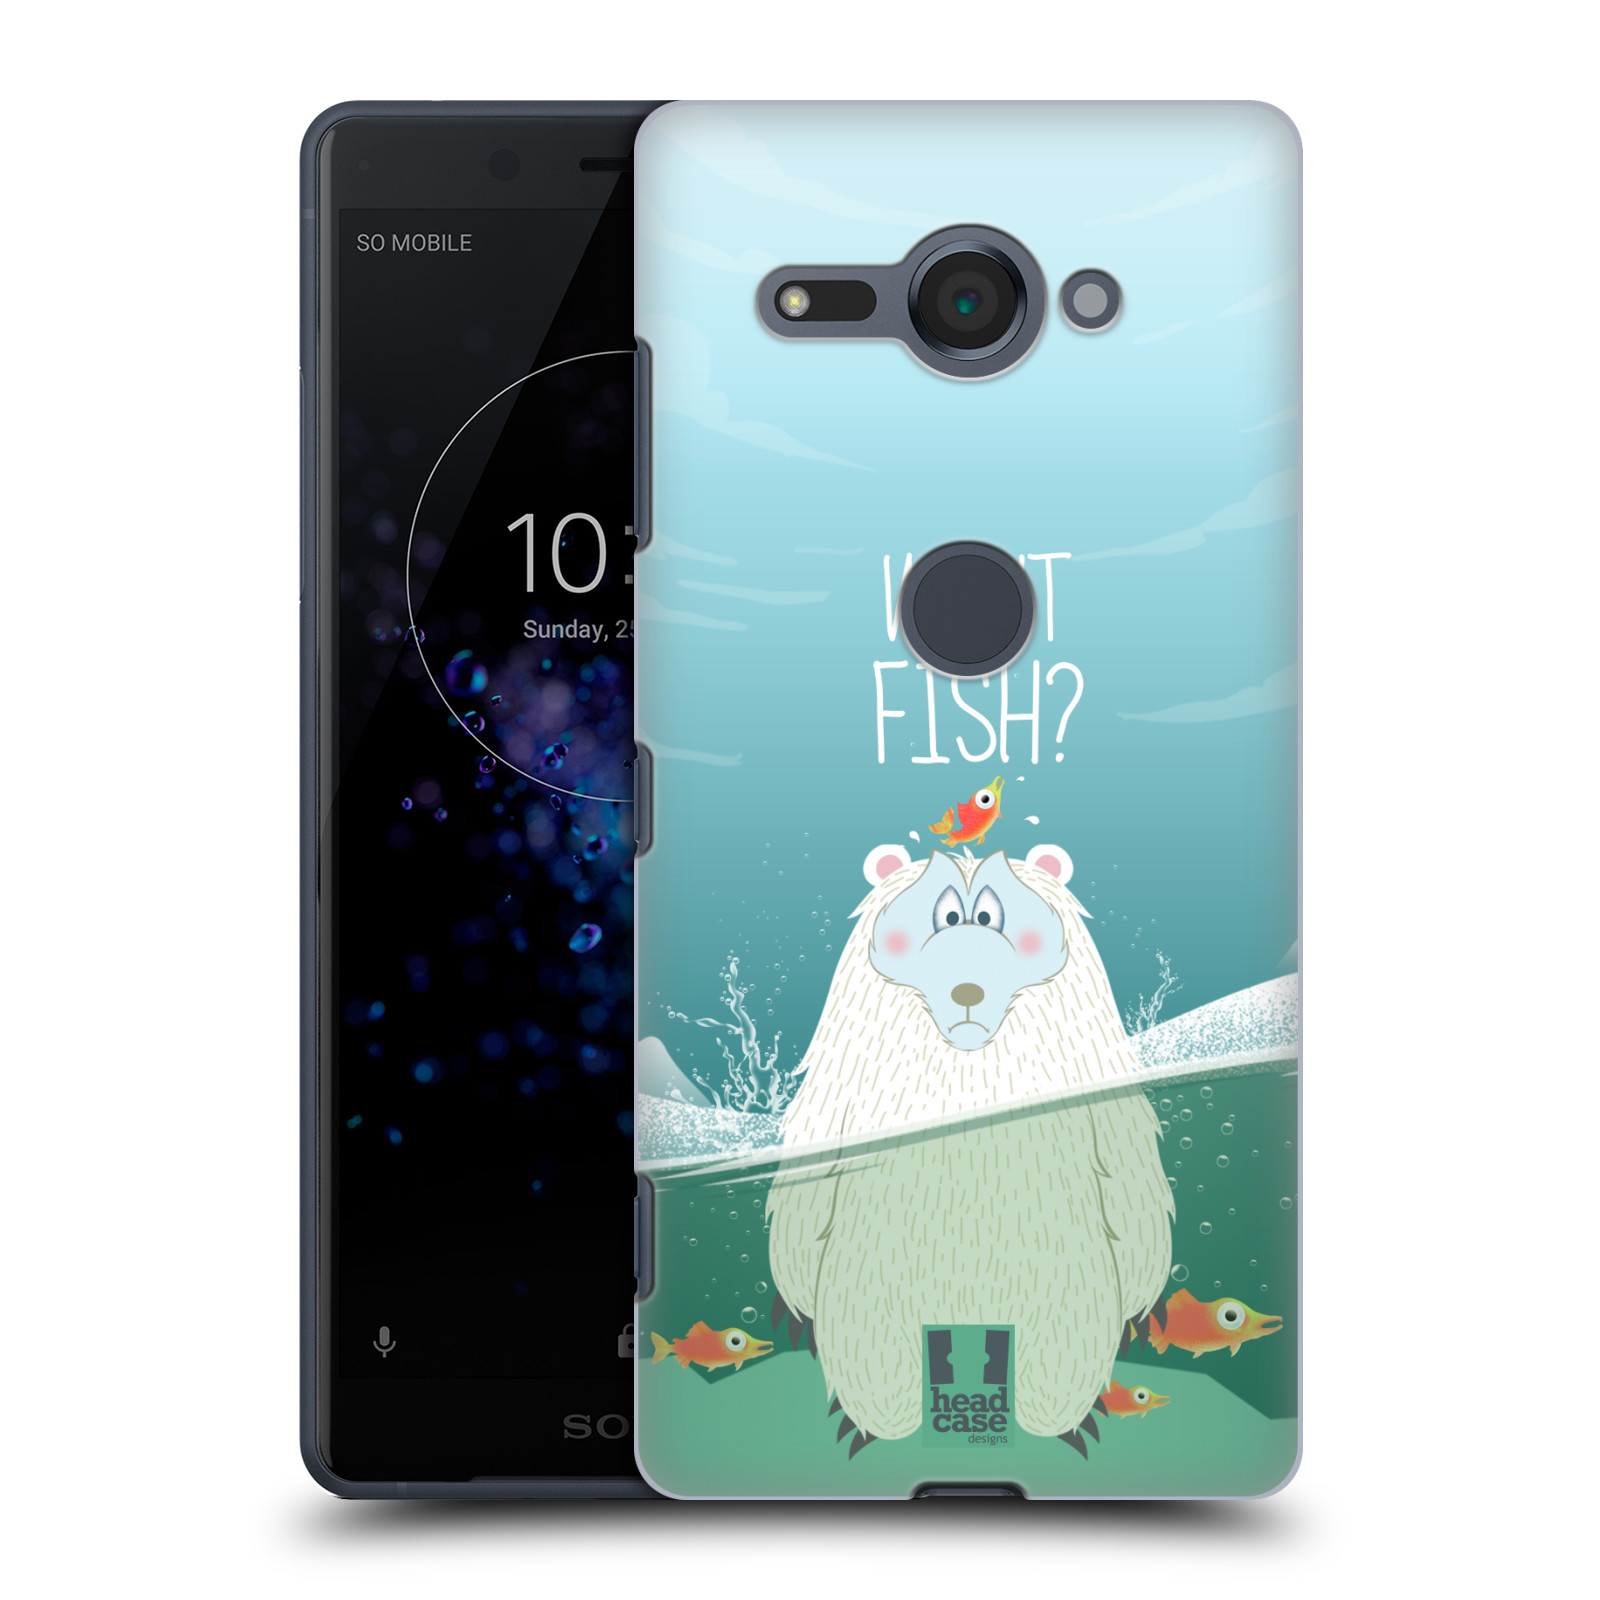 Plastové pouzdro na mobil Sony Xperia XZ2 Compact - Head Case - Medvěd Whut Fish?